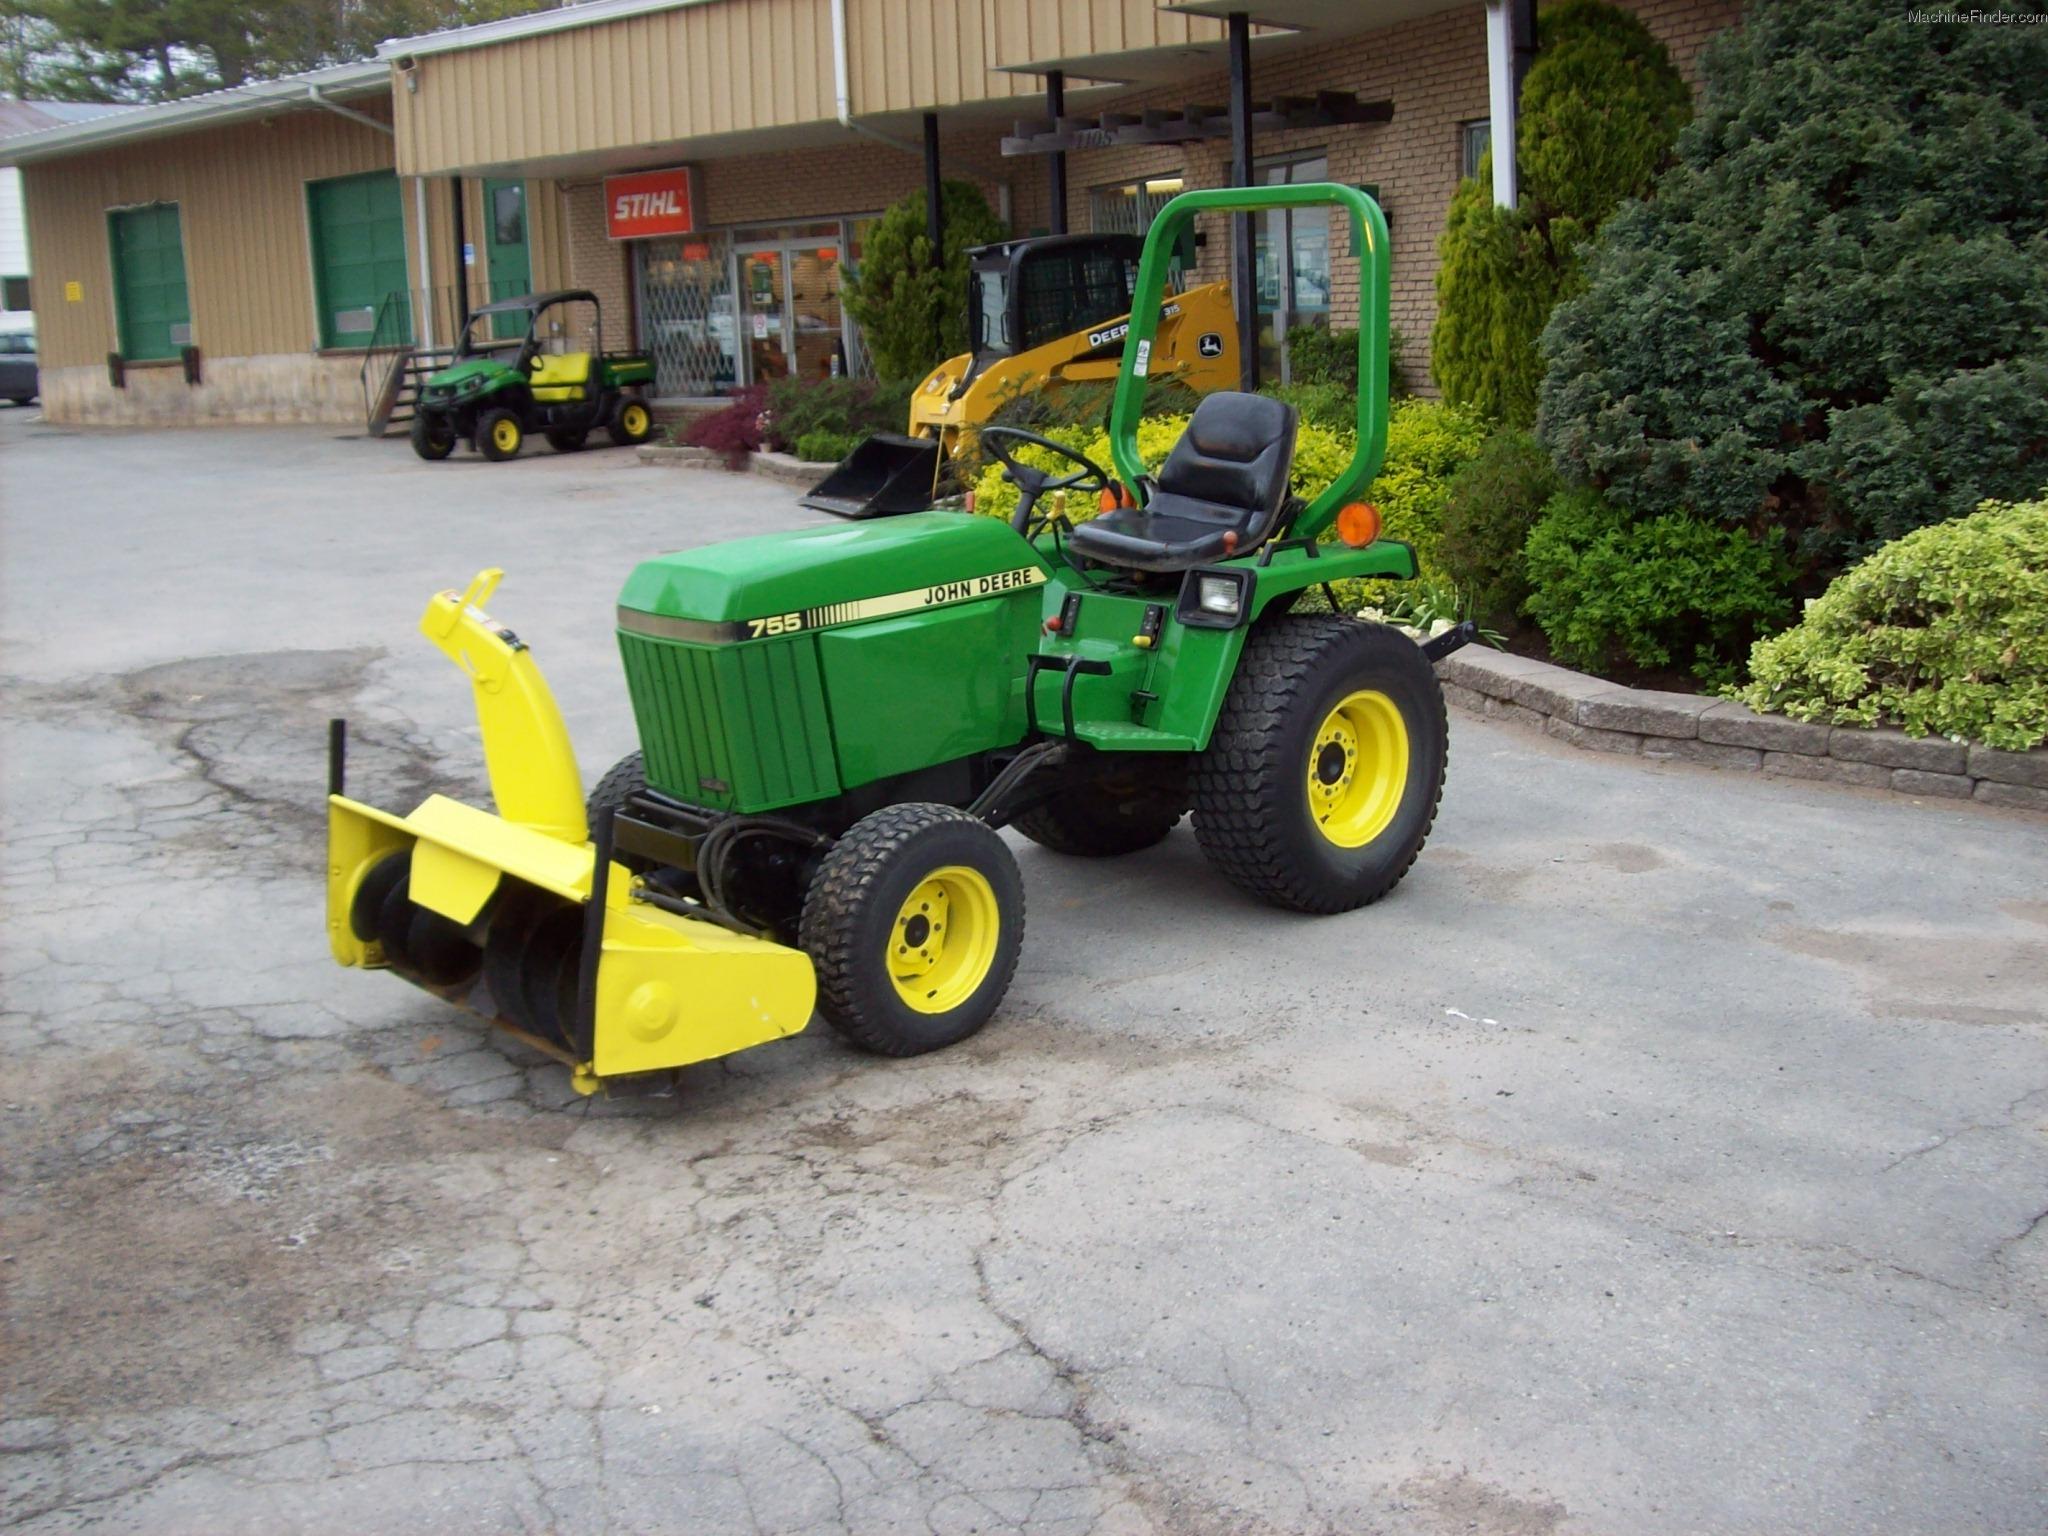 1989 John Deere 755 Tractors - Compact (1-40hp.) - John ...